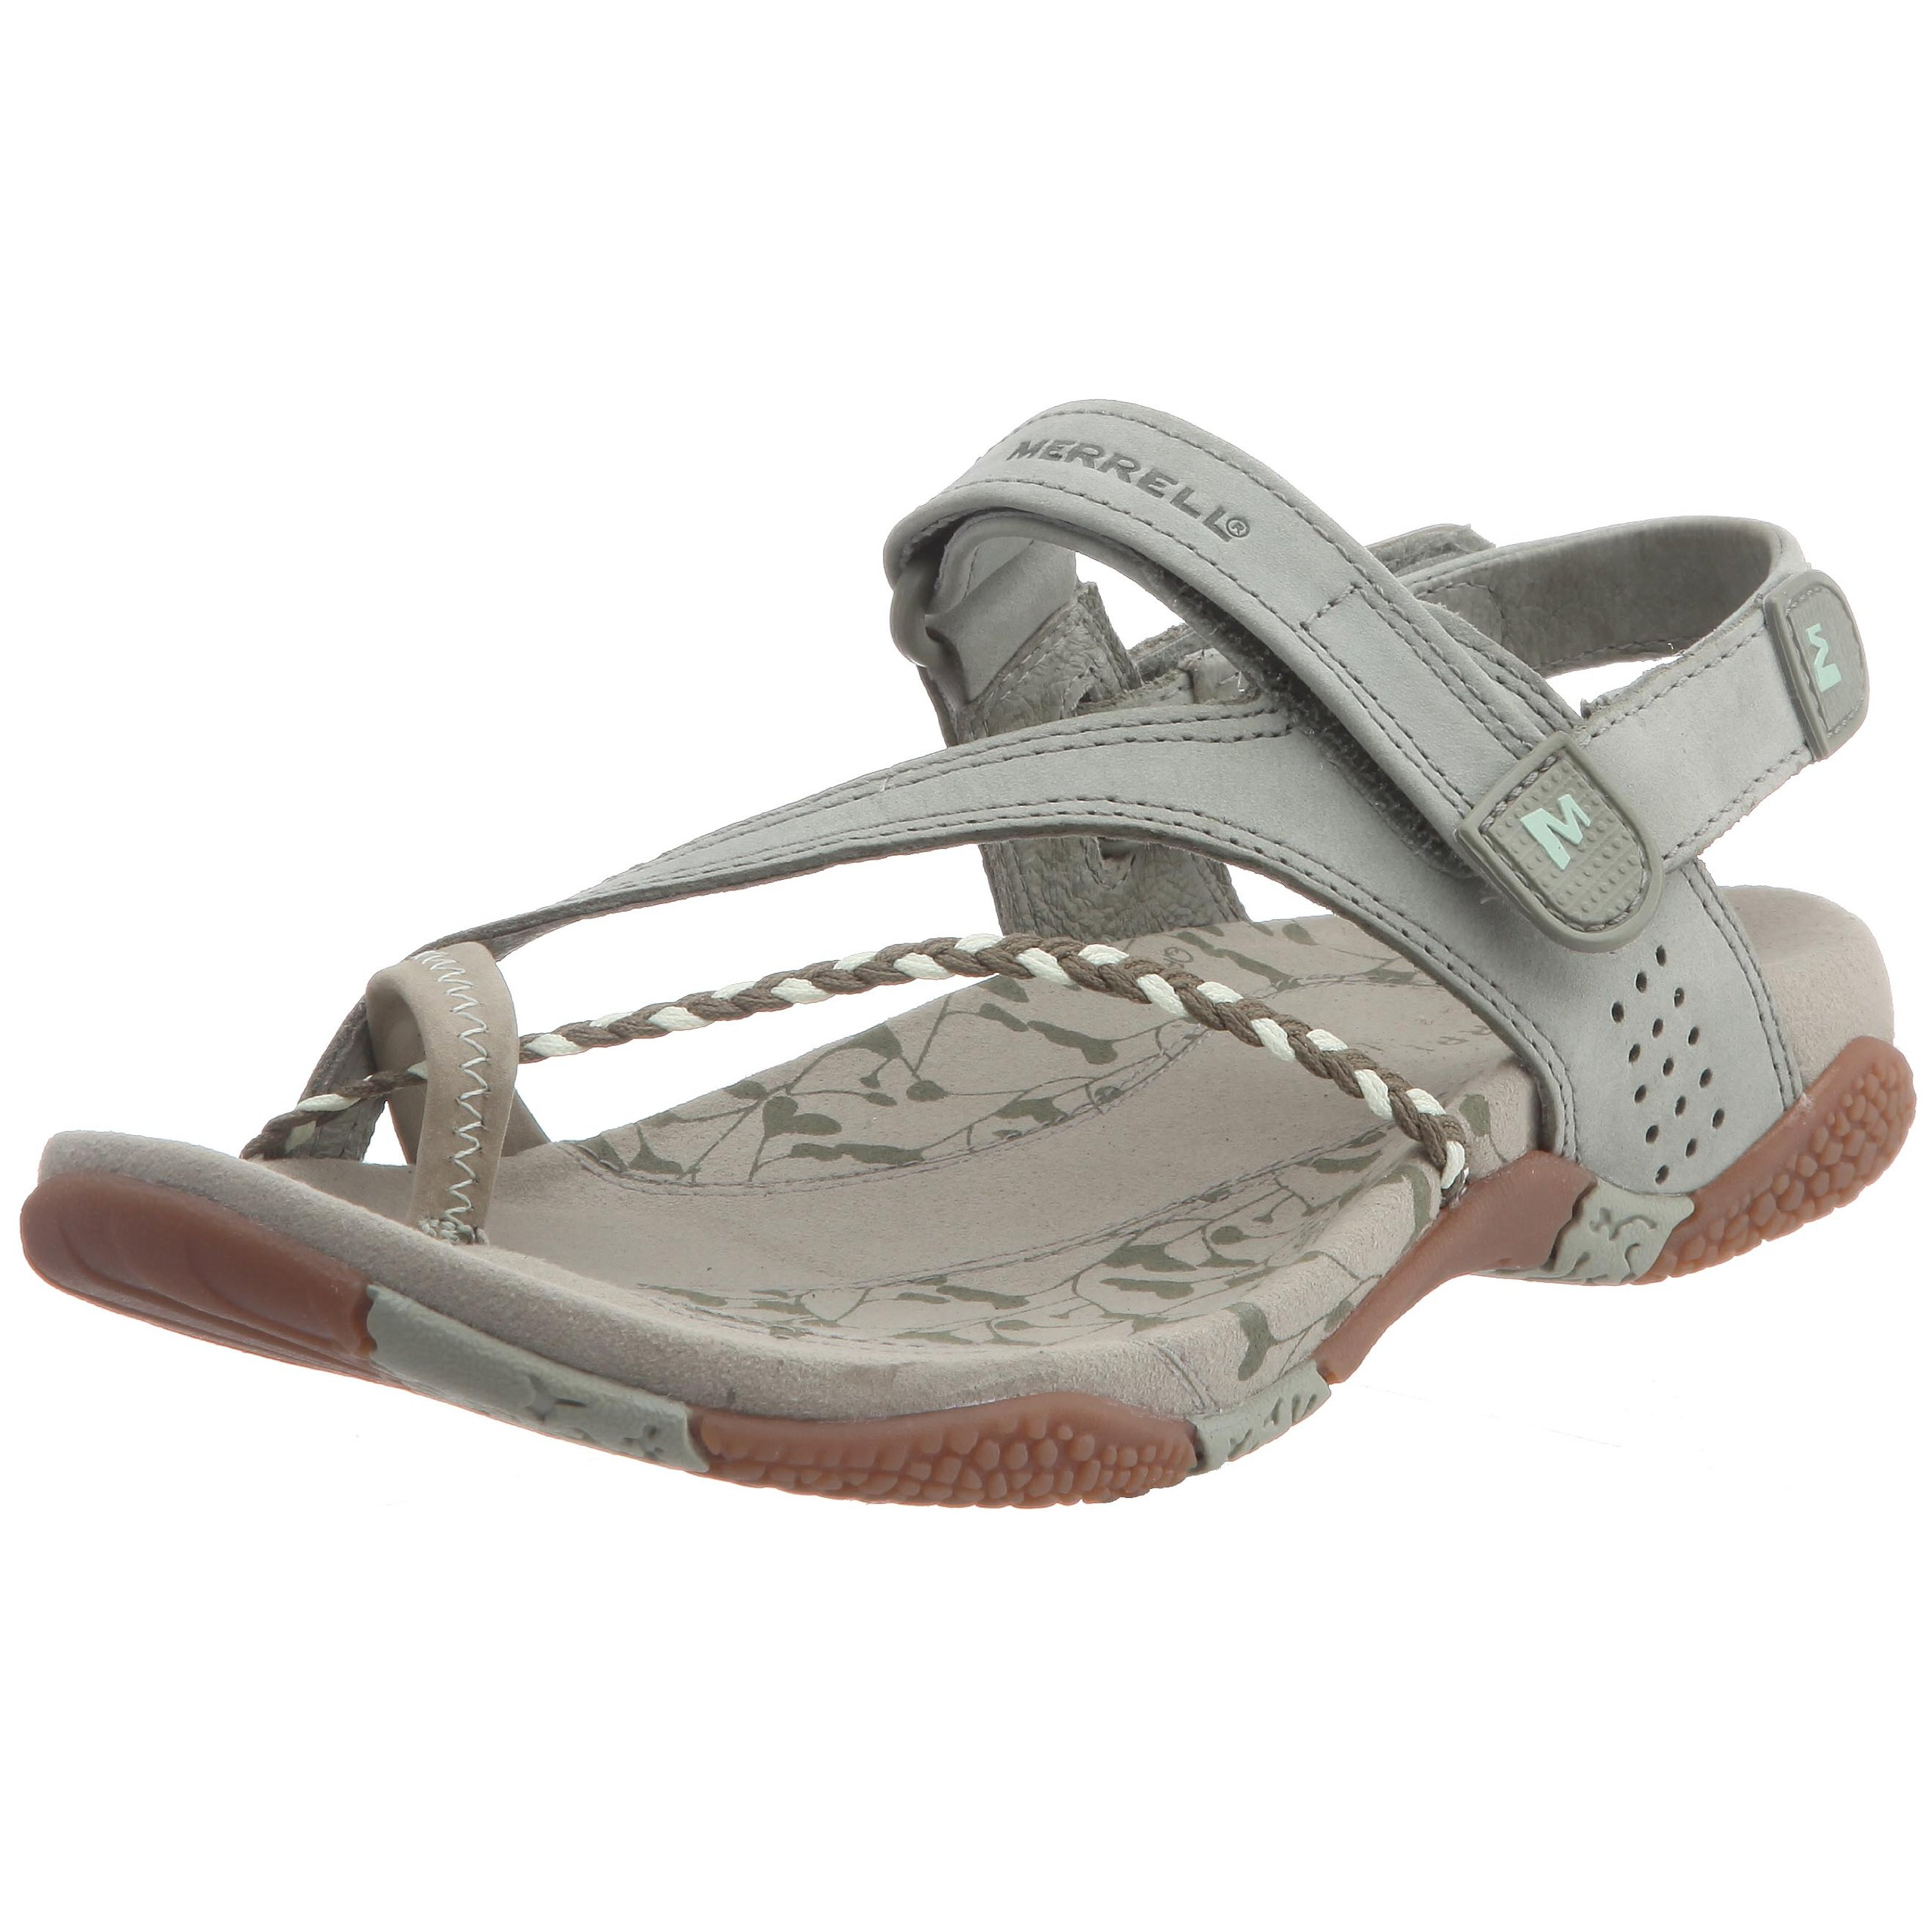 merrell ladies sandals size 6 uk